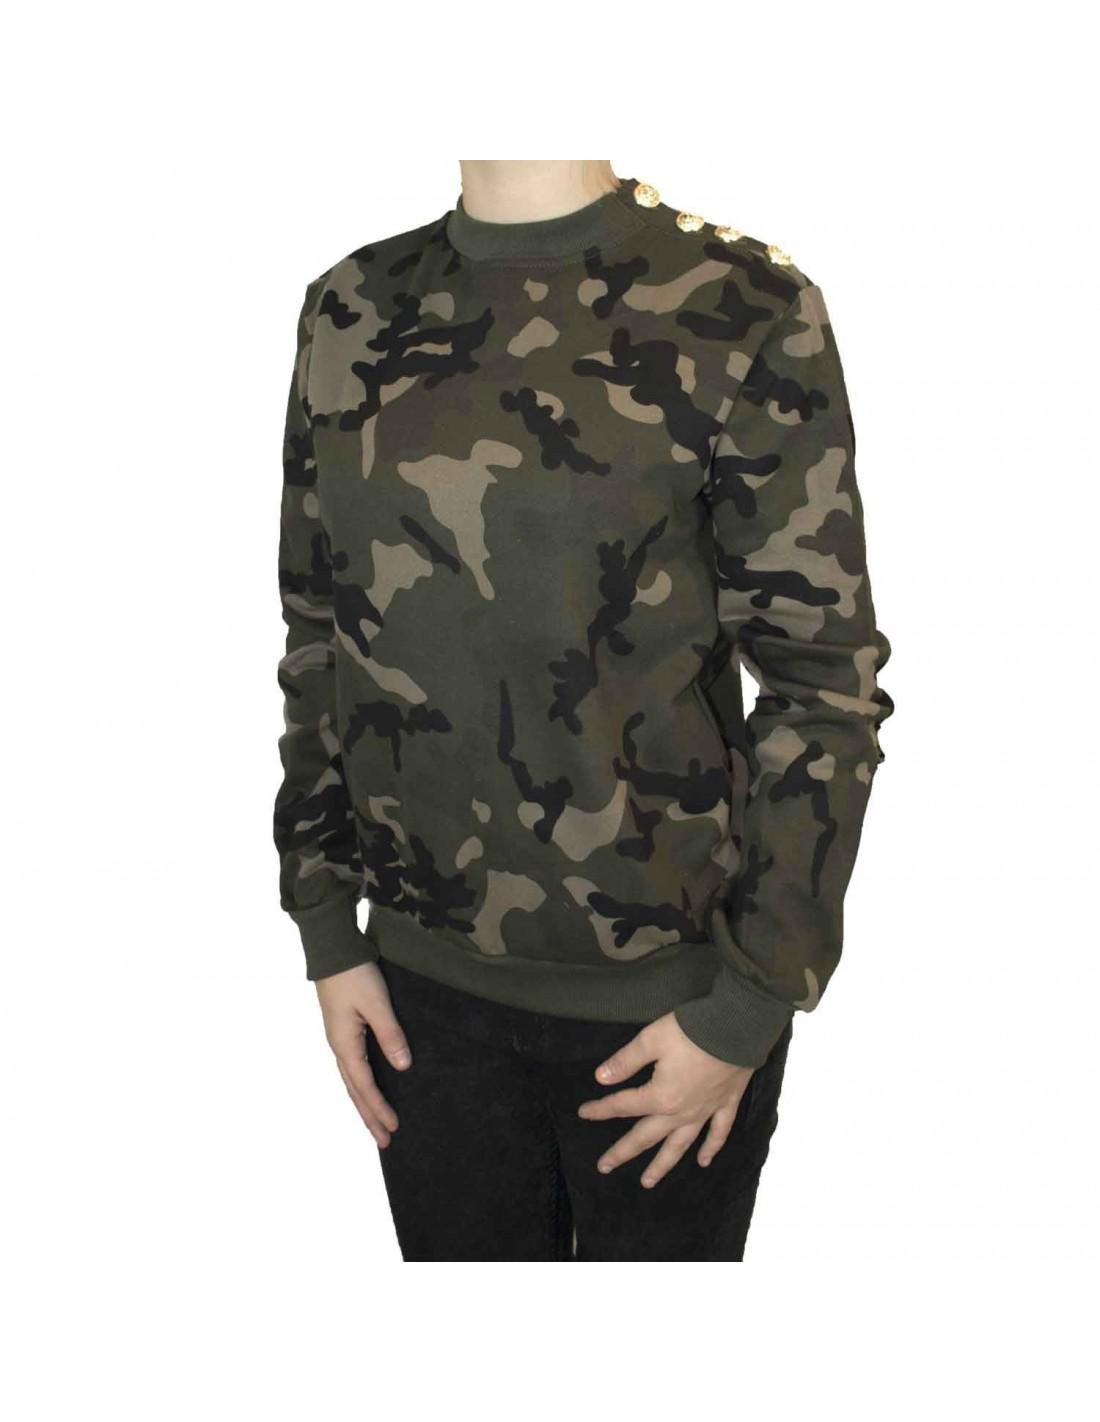 sweat militaire femme motif camouflage kaki boutons dor s. Black Bedroom Furniture Sets. Home Design Ideas